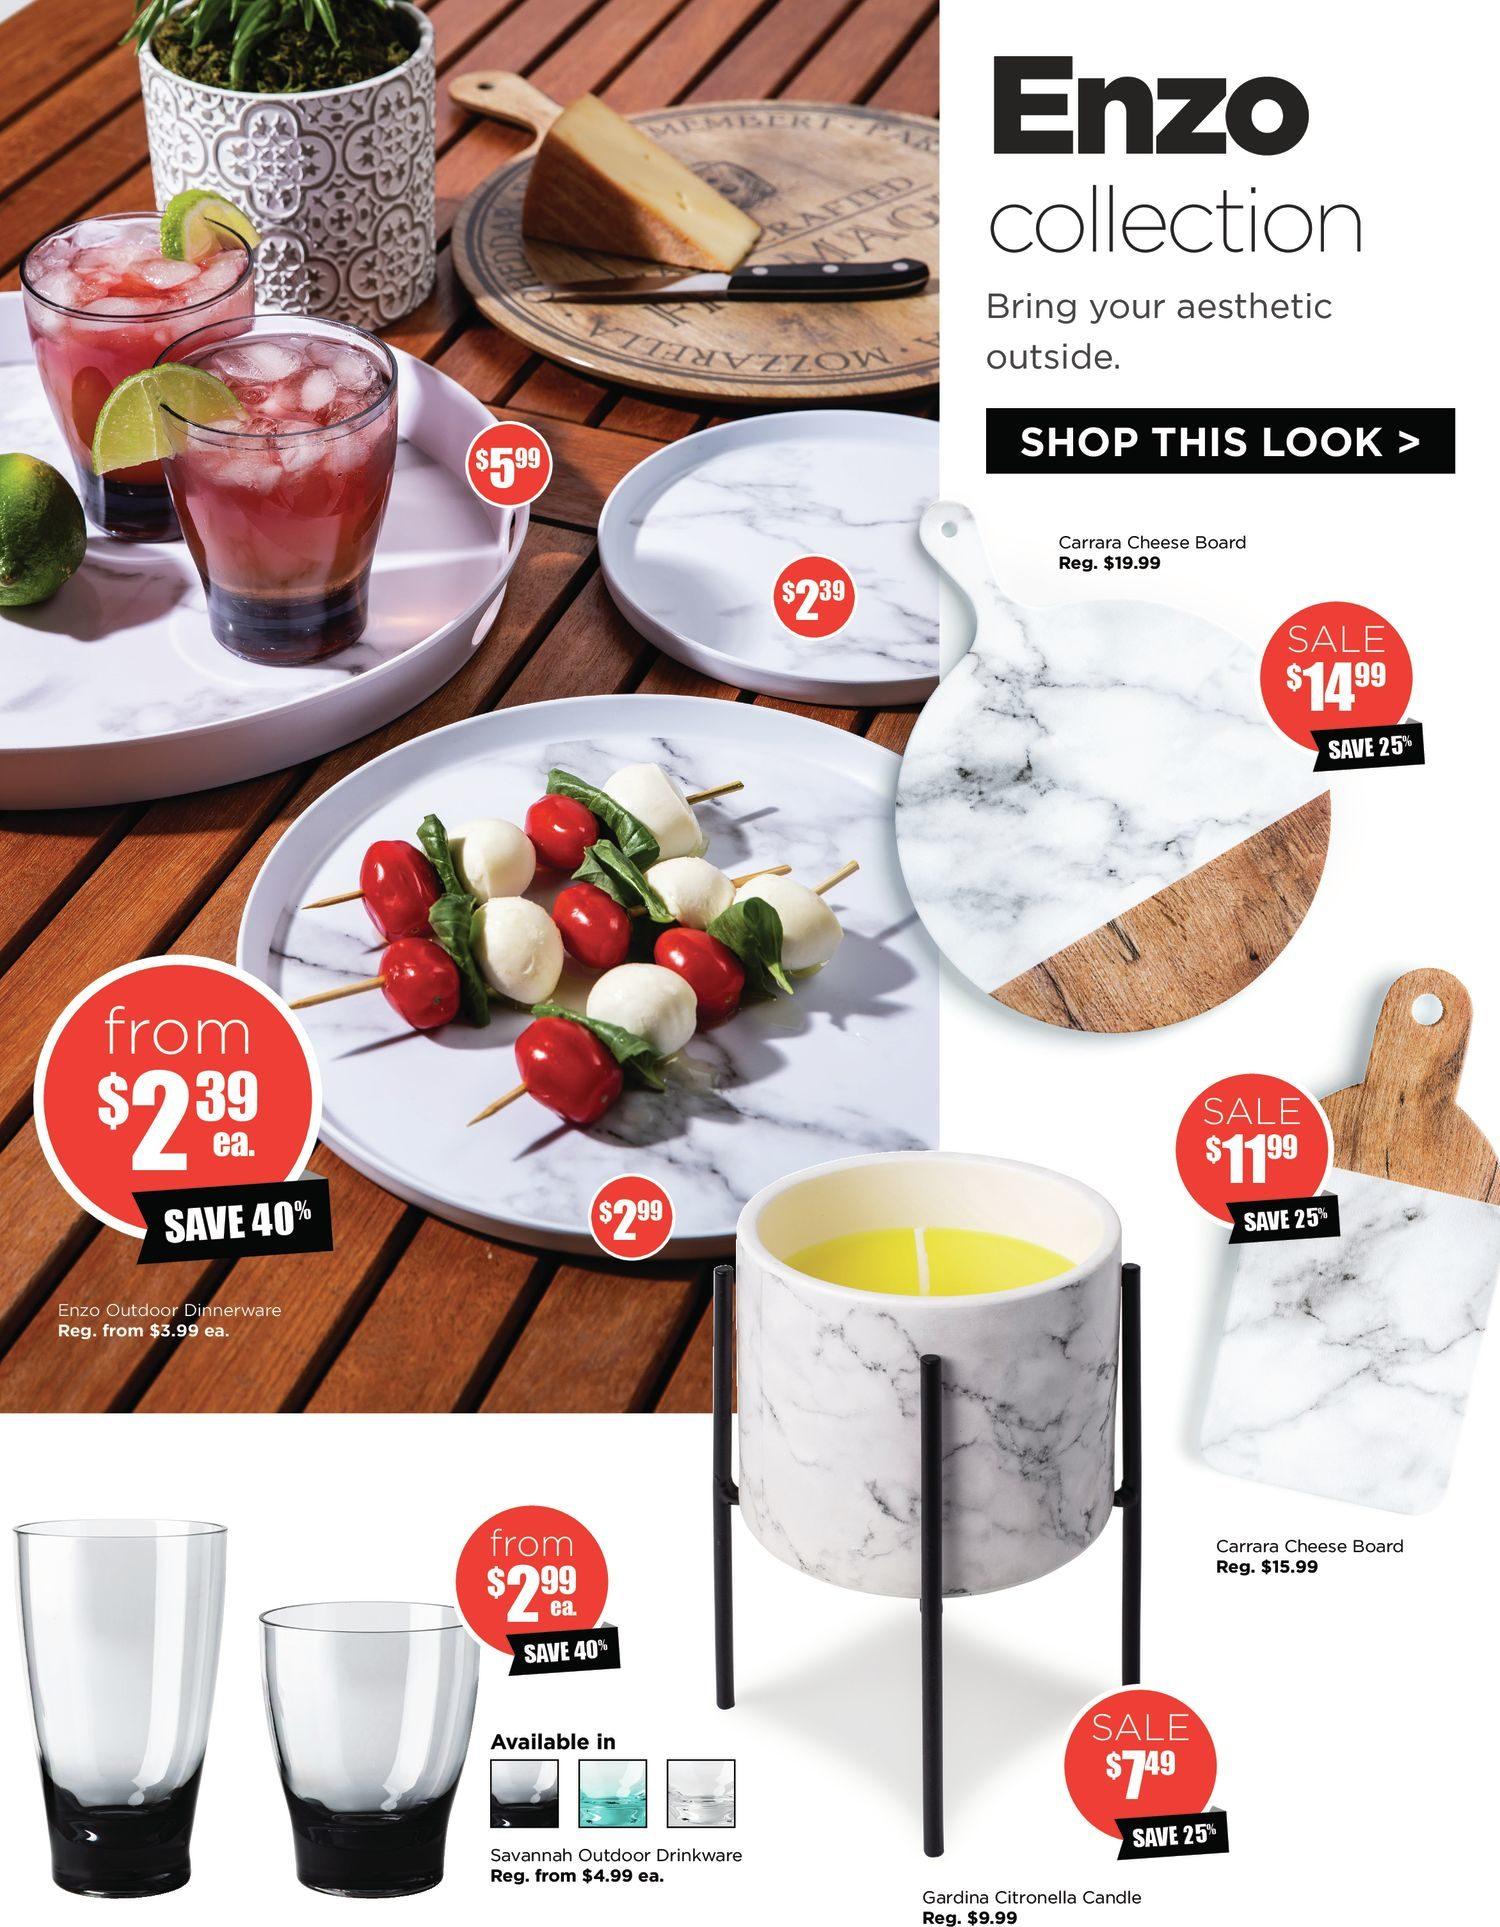 Kitchen Stuff Plus - Outdoor Entertaining Event - Page 3